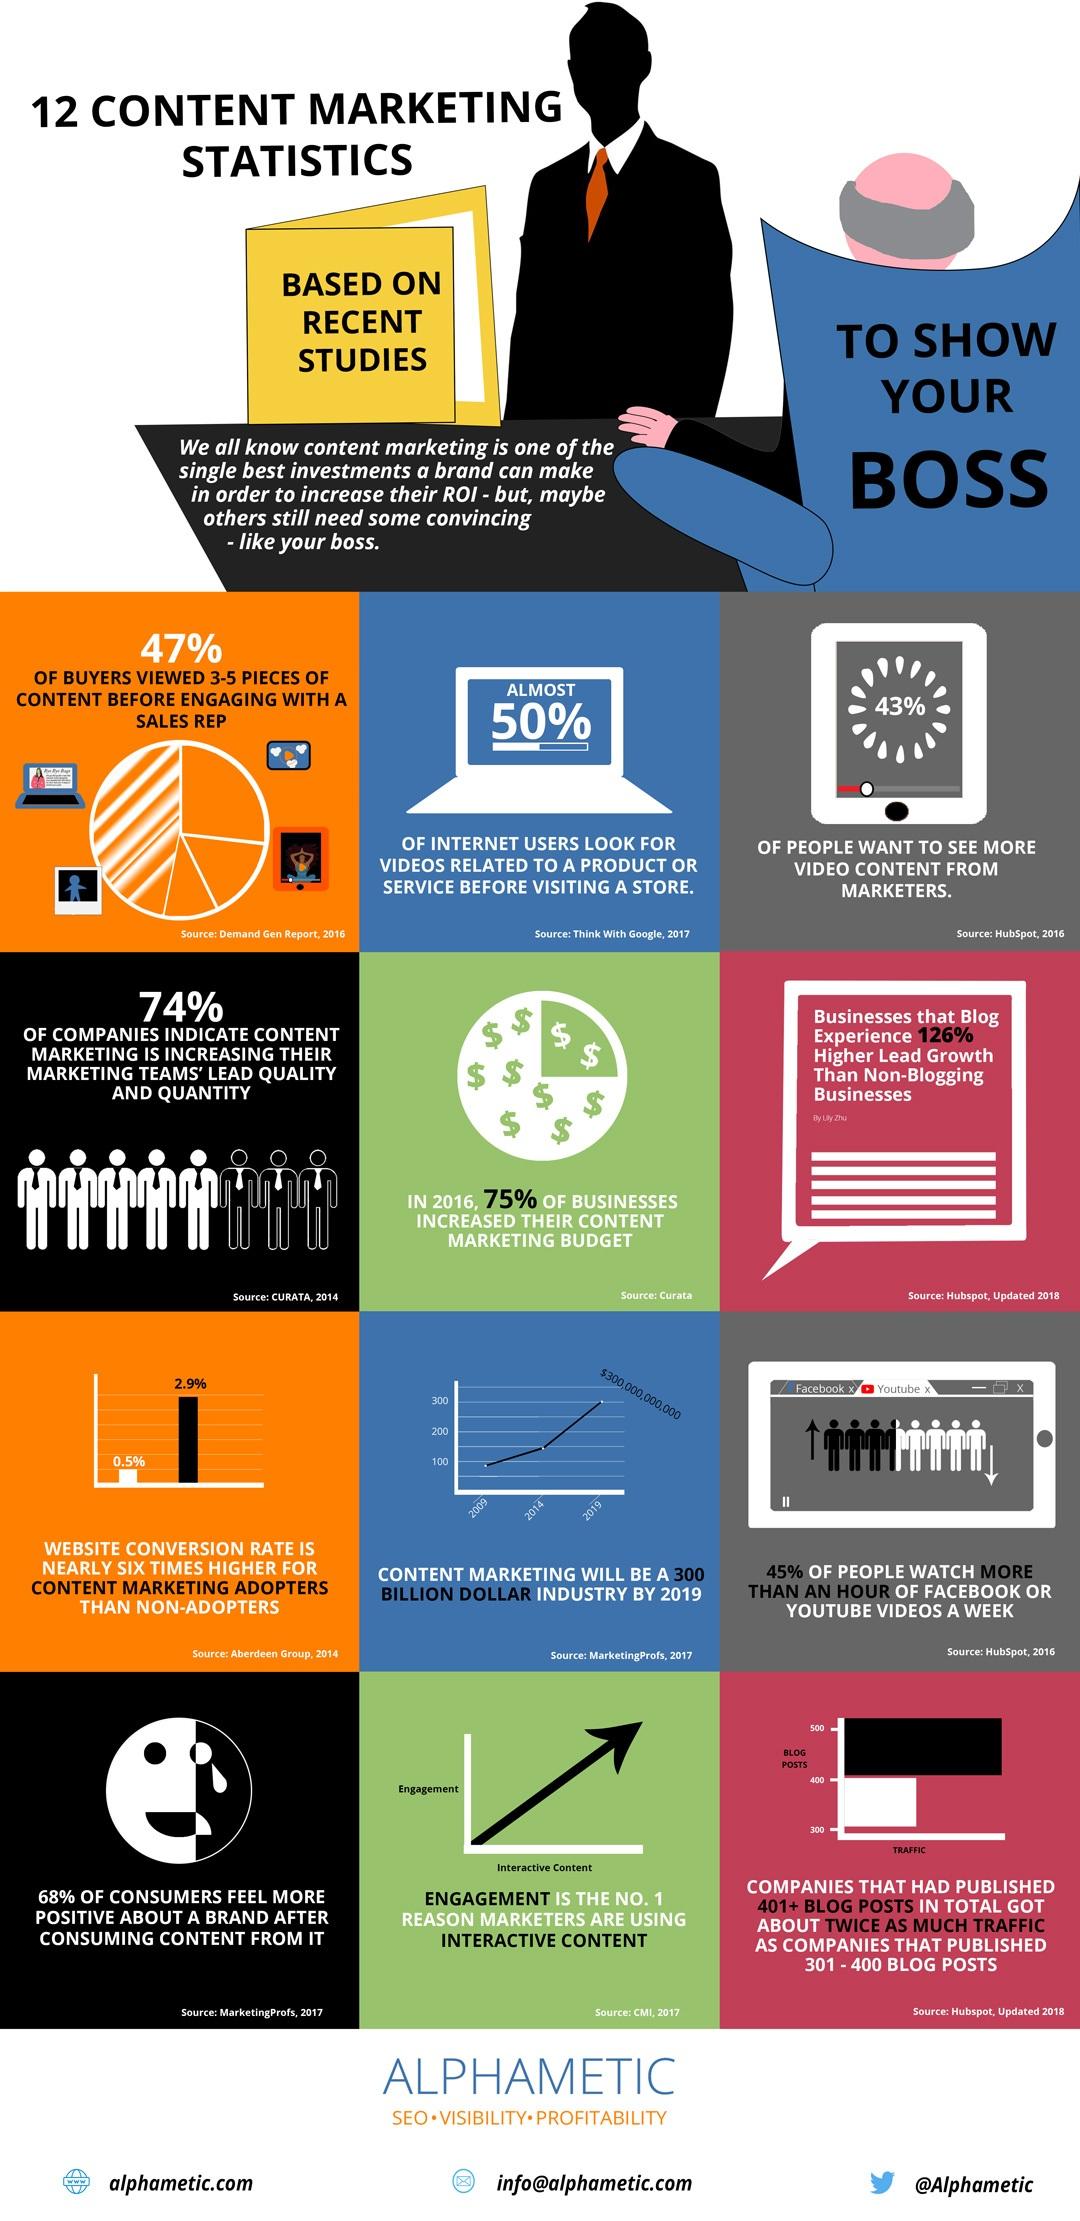 content marketing statistics 2018 infographic